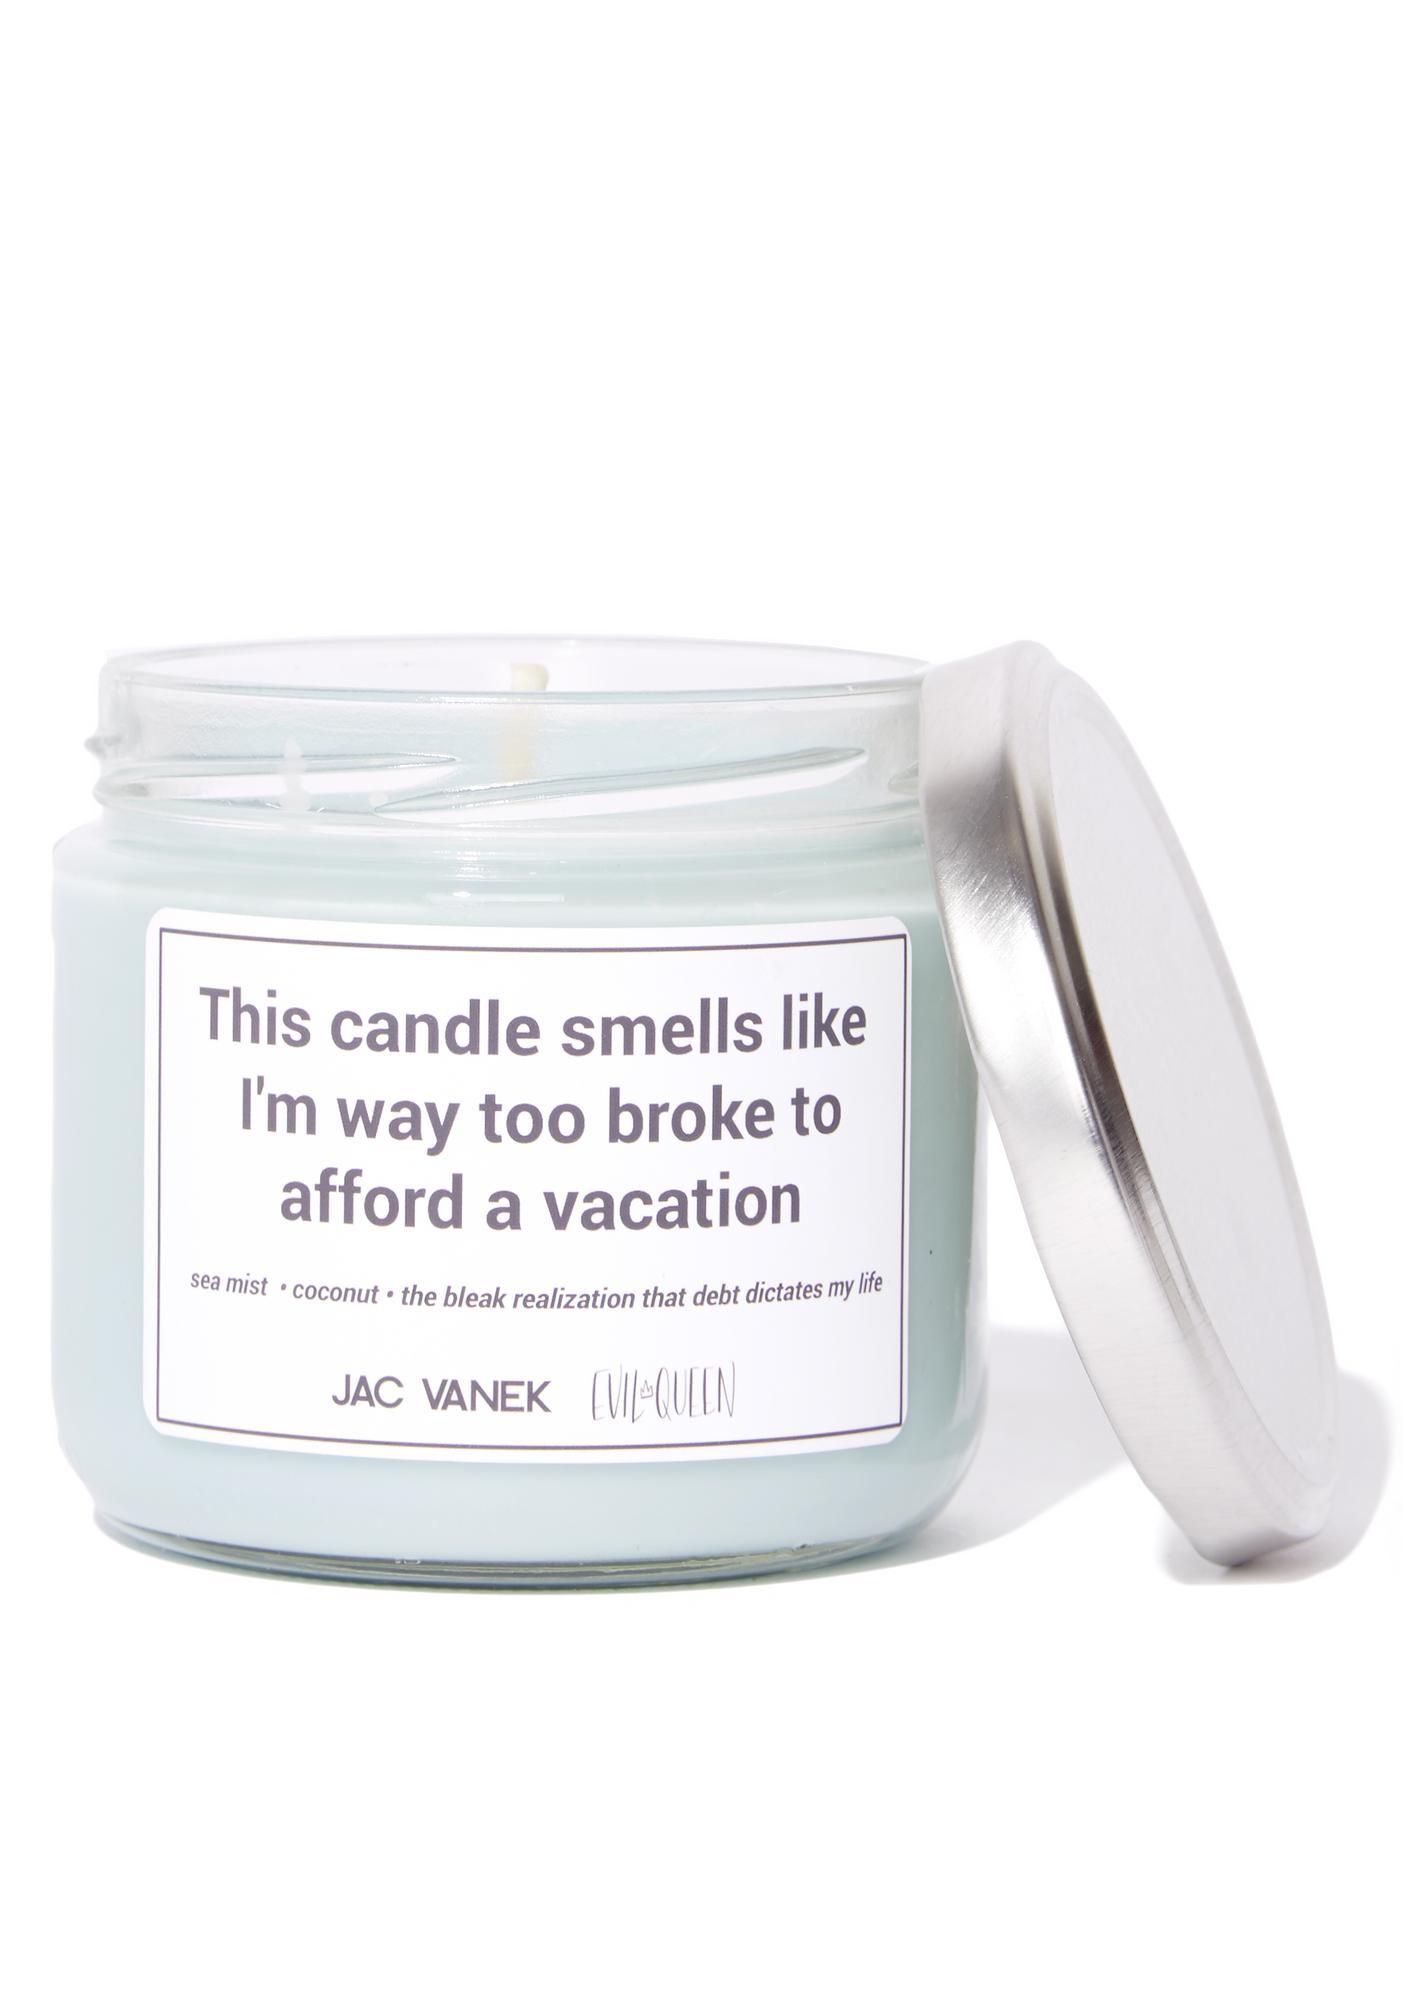 Jac Vanek Too Broke Scented Candle